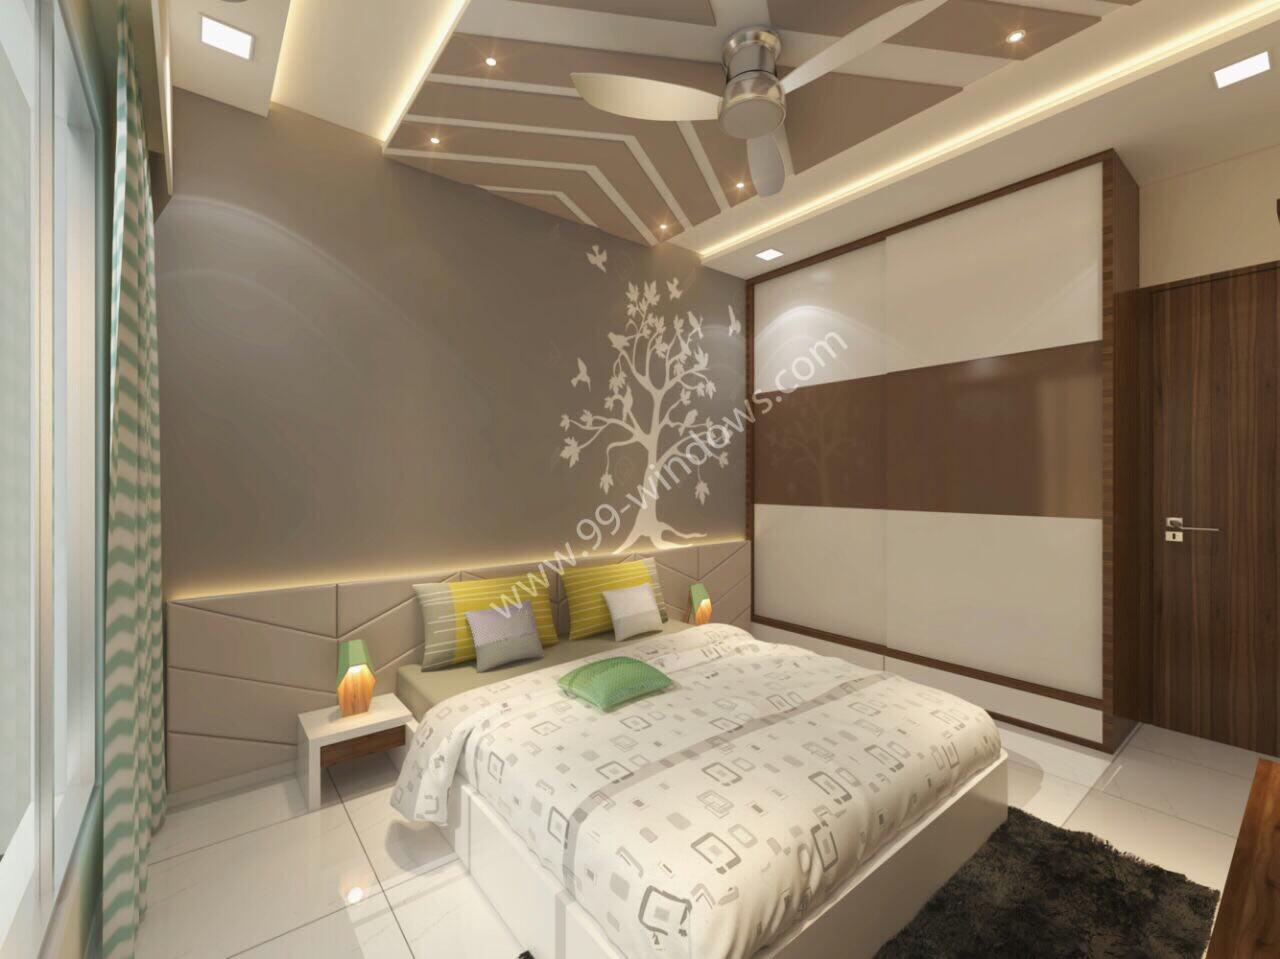 Walls of Calm by 99 Windows Modern | Interior Design Photos & Ideas